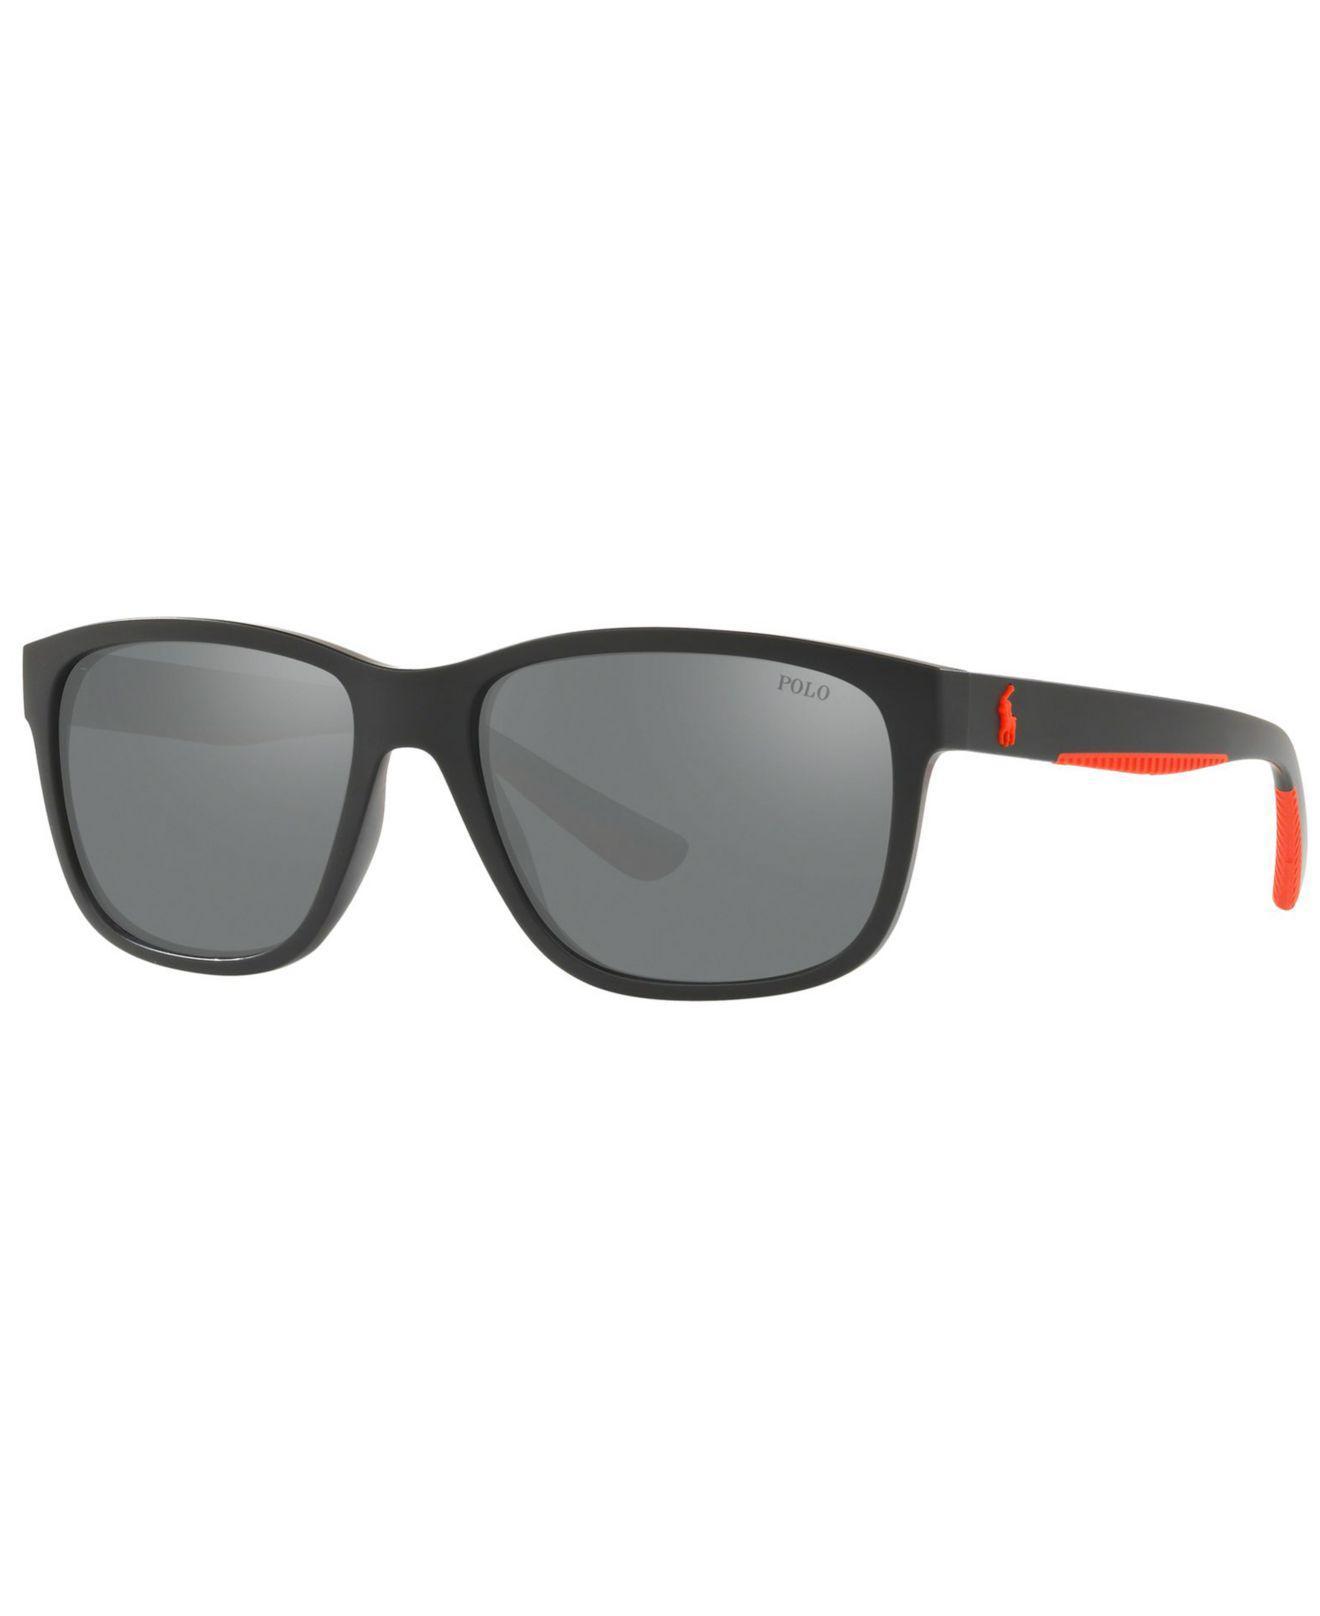 02b762b63b Polo Ralph Lauren. Men s Black Sunglasses ...